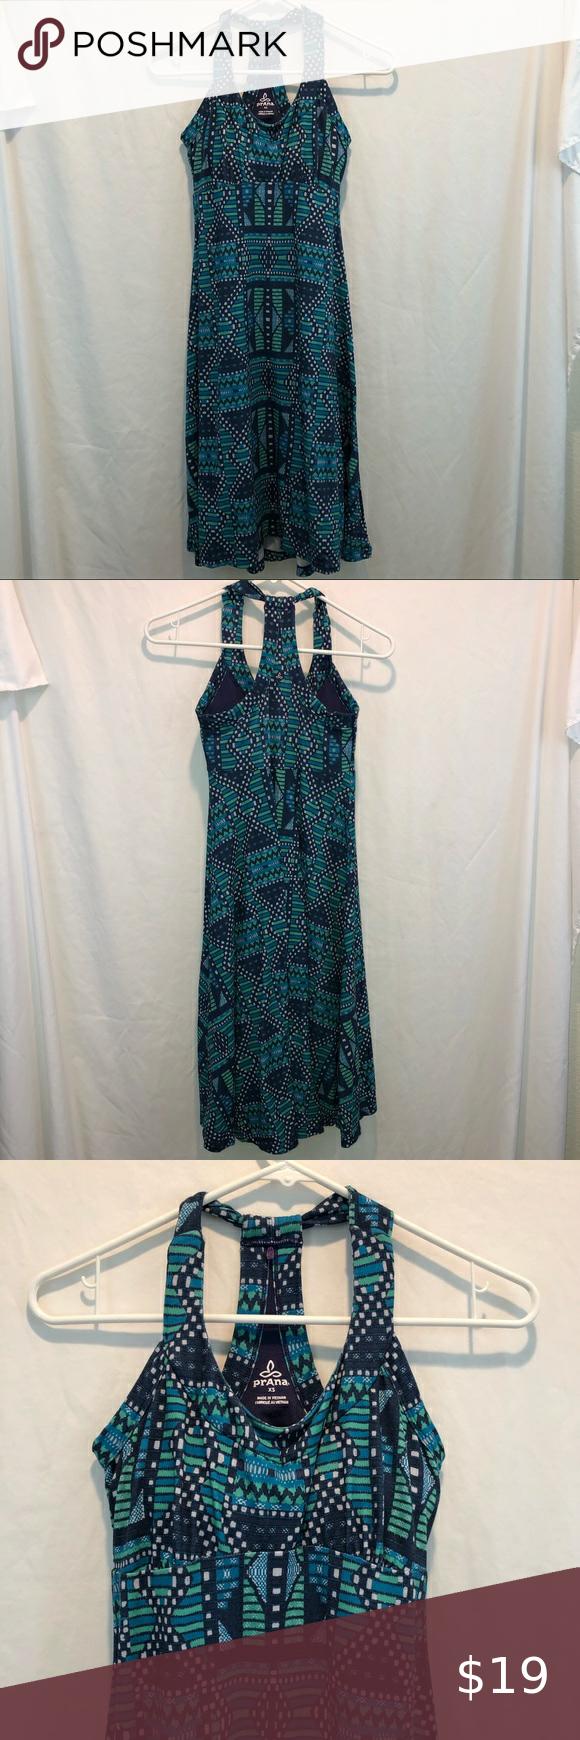 Prana Geometric Blue Green Summer Halter Dress Xs Halter Dress Summer Summer Halters Dresses Xs [ 1740 x 580 Pixel ]